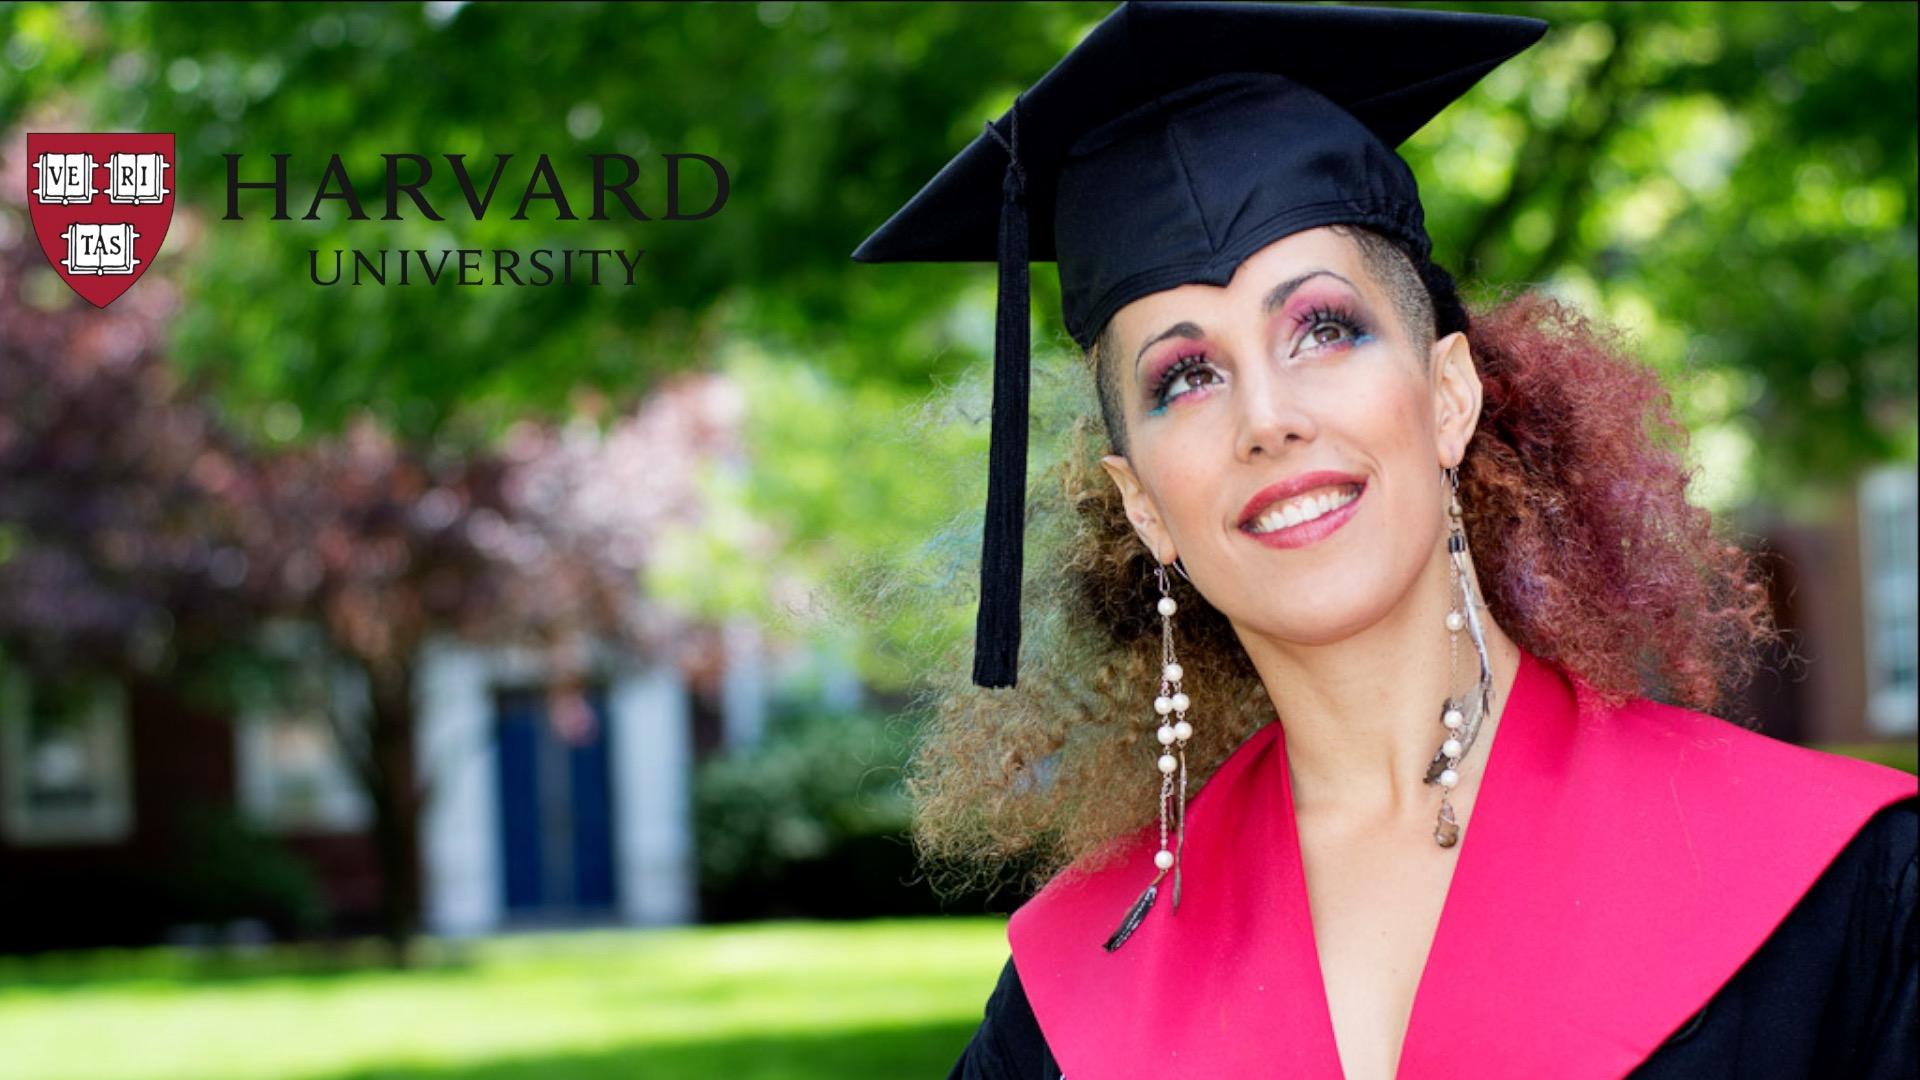 Harvard University Commencement